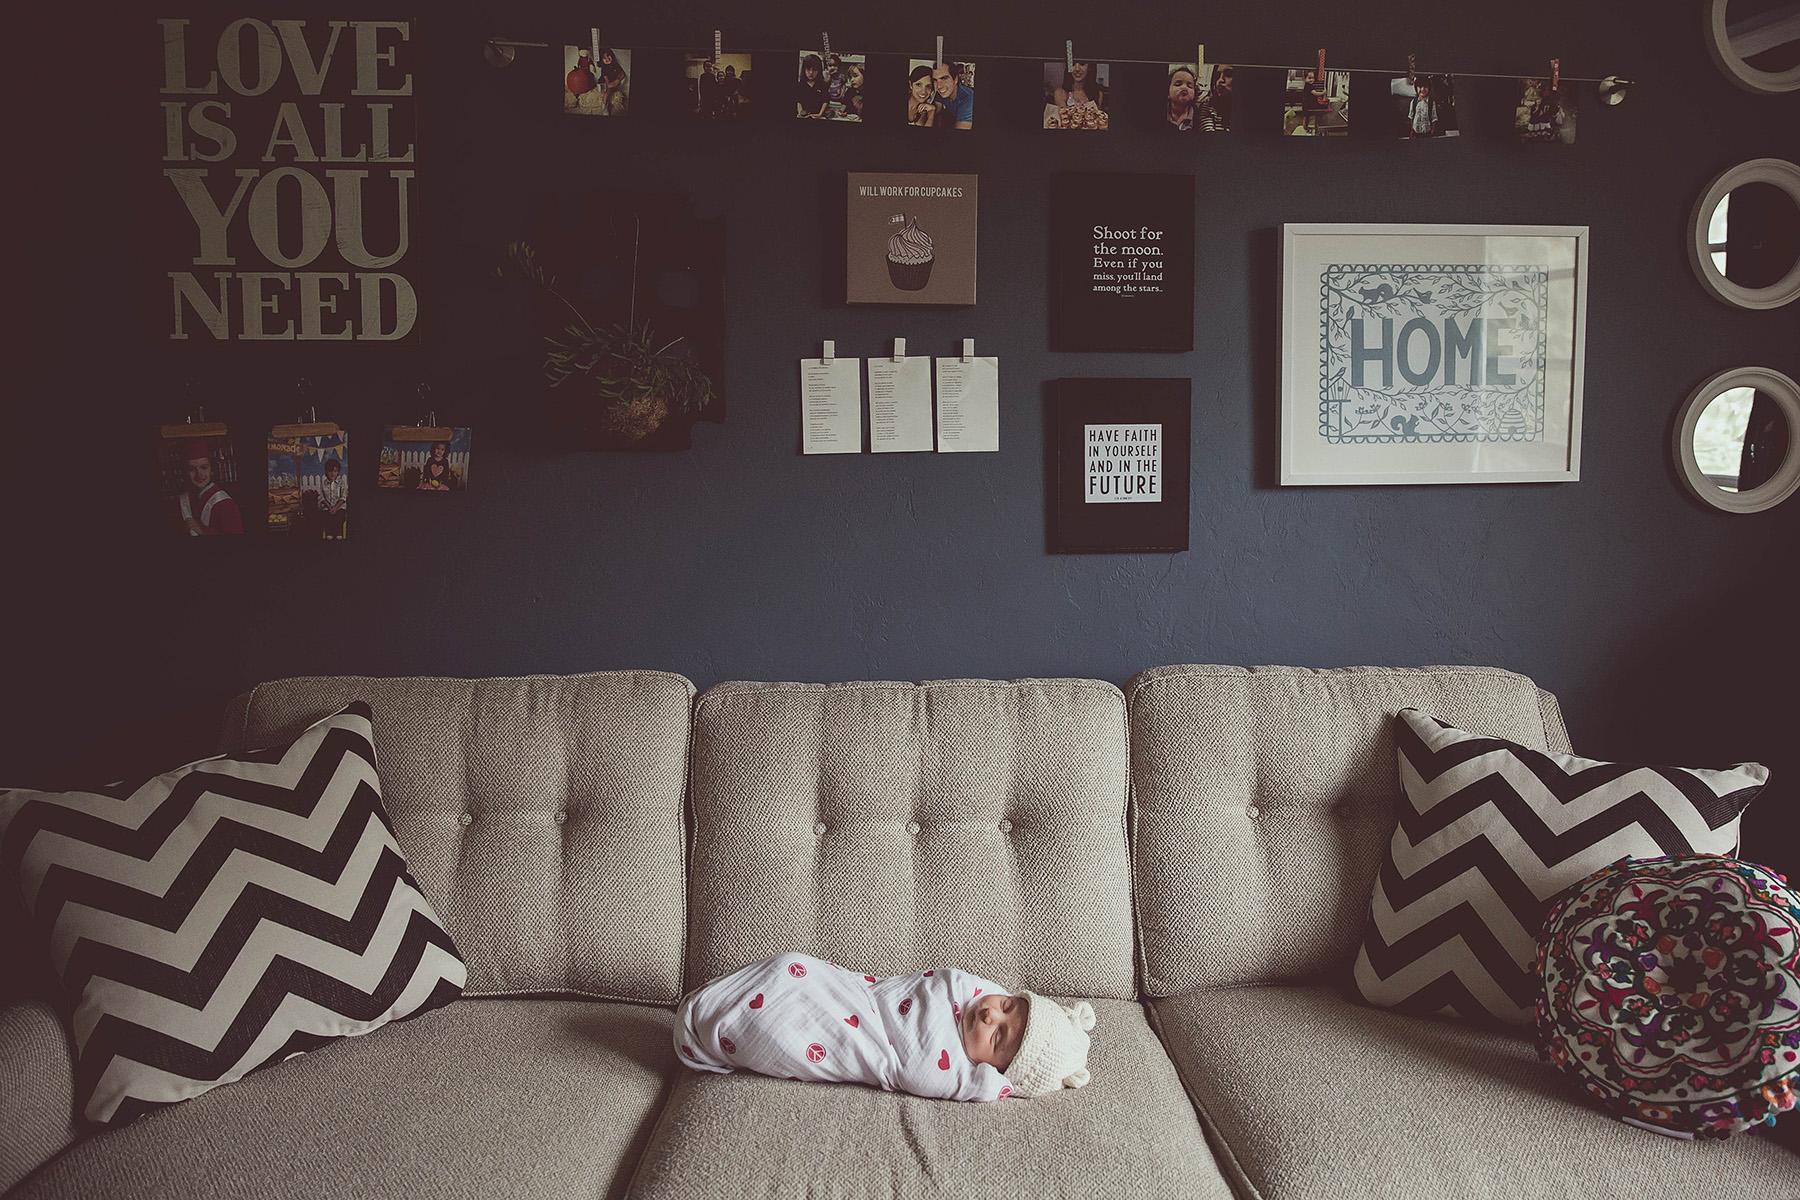 miami-newborn-photographer-love-life-milestones-little-lifestyle-photography-famous-stars.jpg